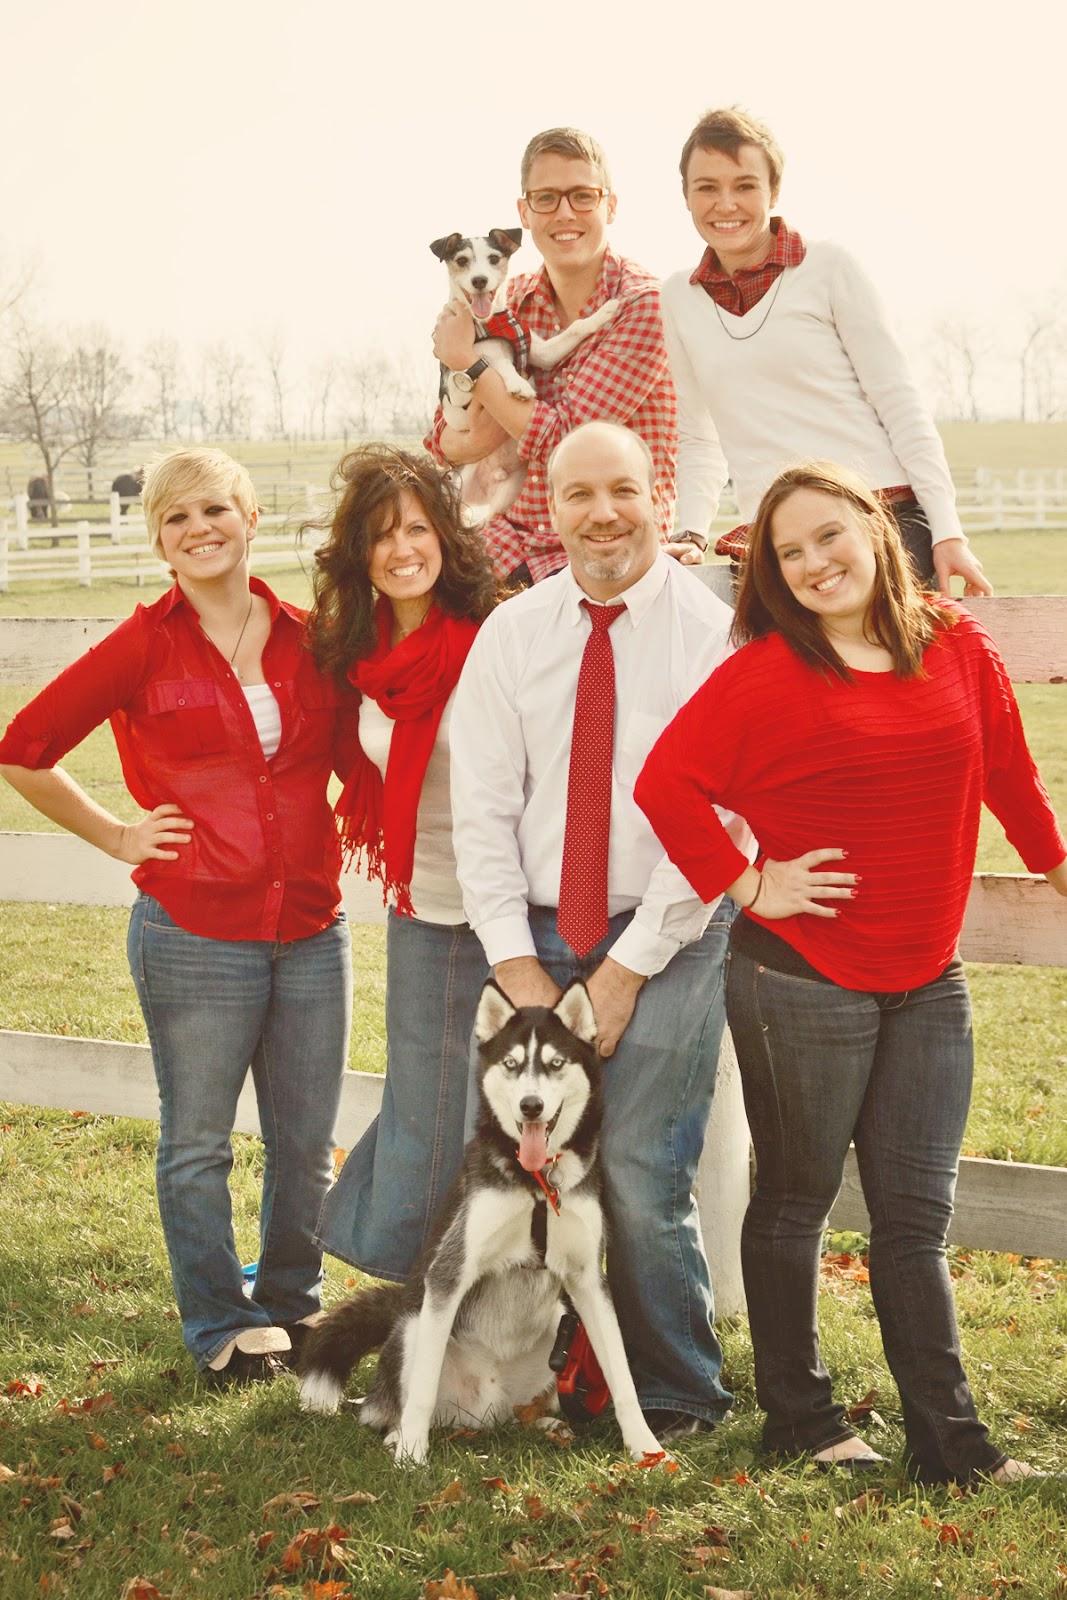 Professional Christmas Family Photo Ideas